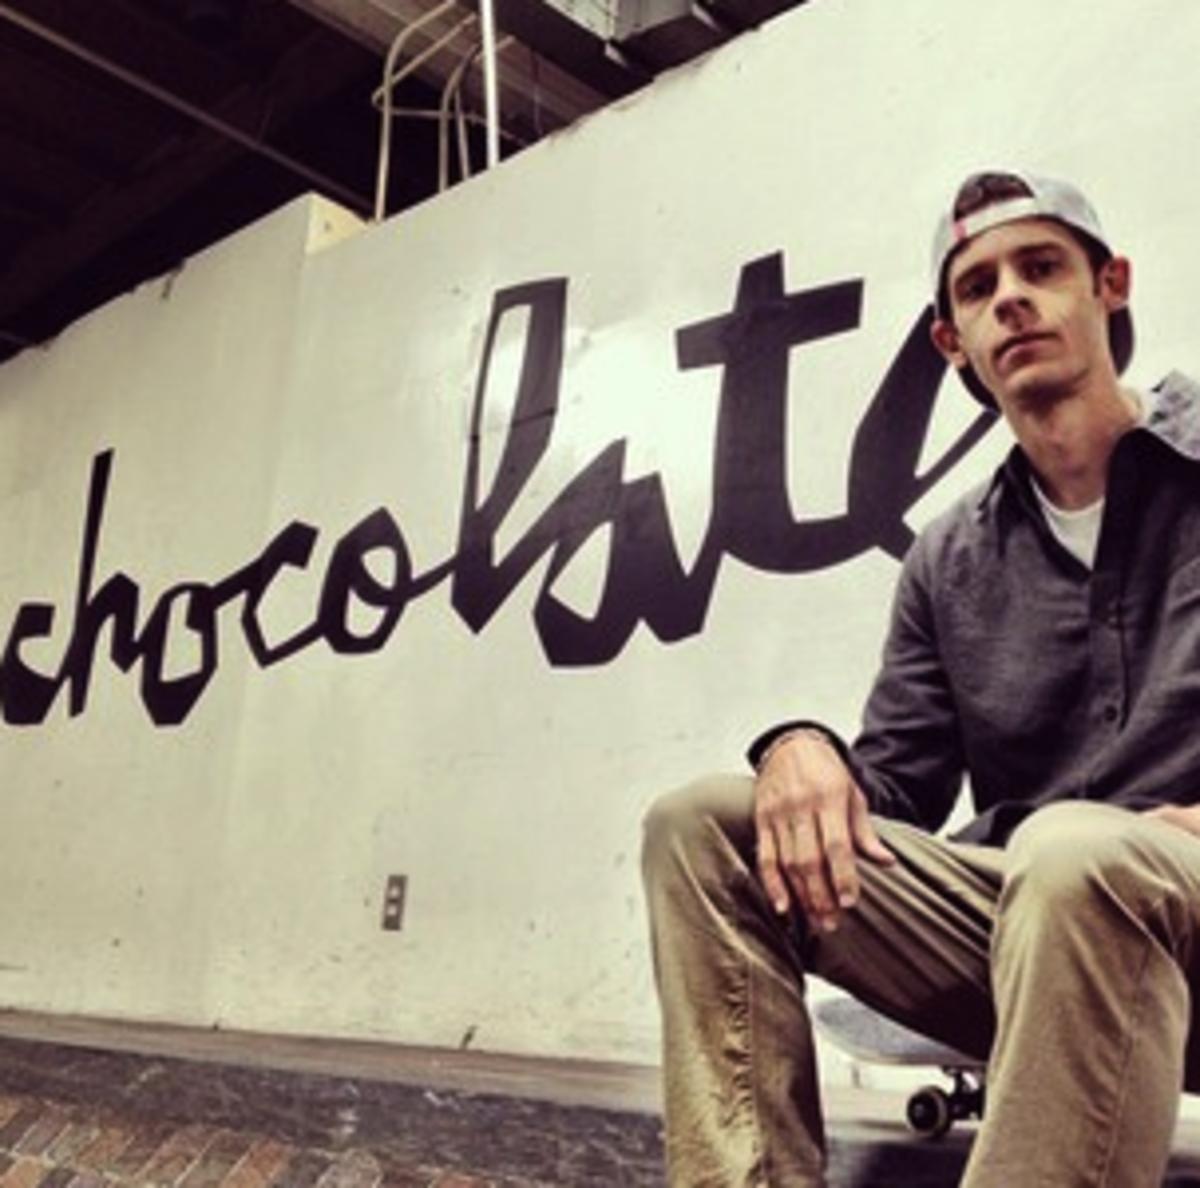 Professional skateboarder, Chris Roberts